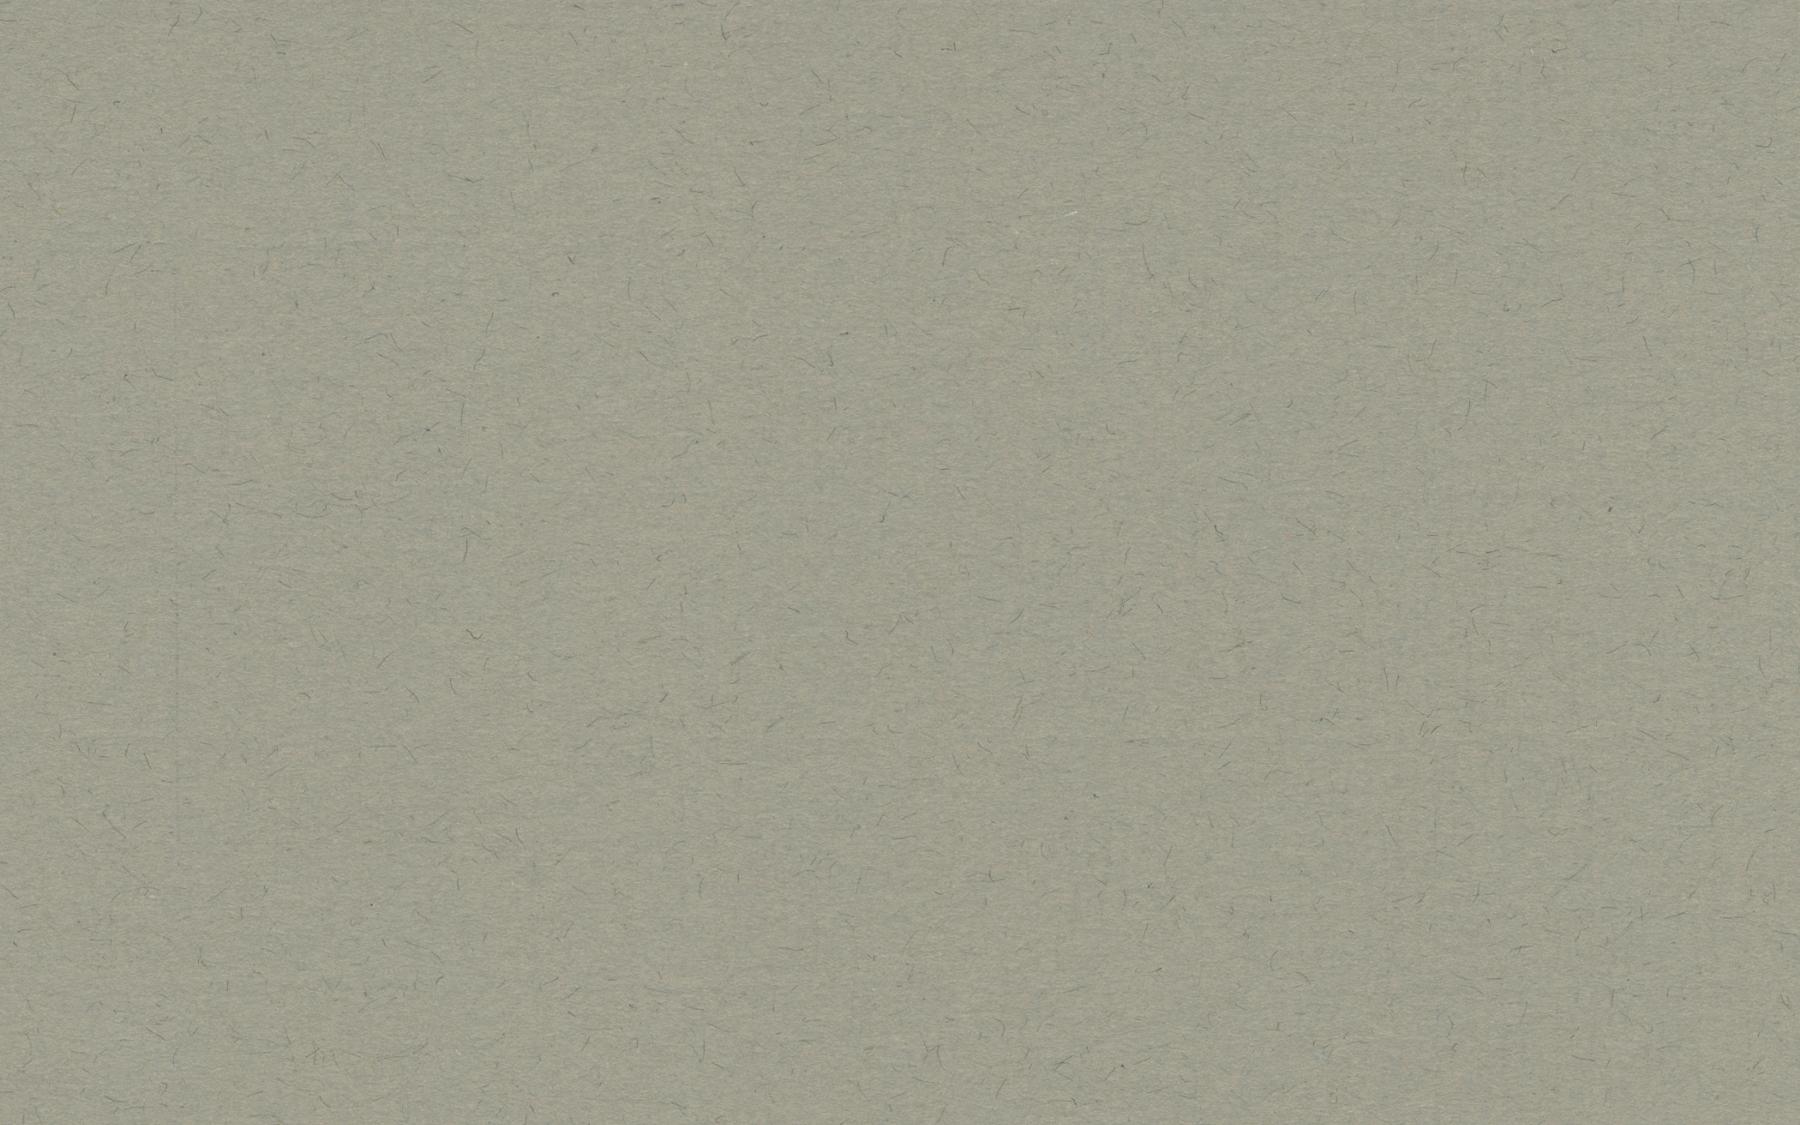 mats alplamat artcare dune board sand bainbridge products mat gemini b